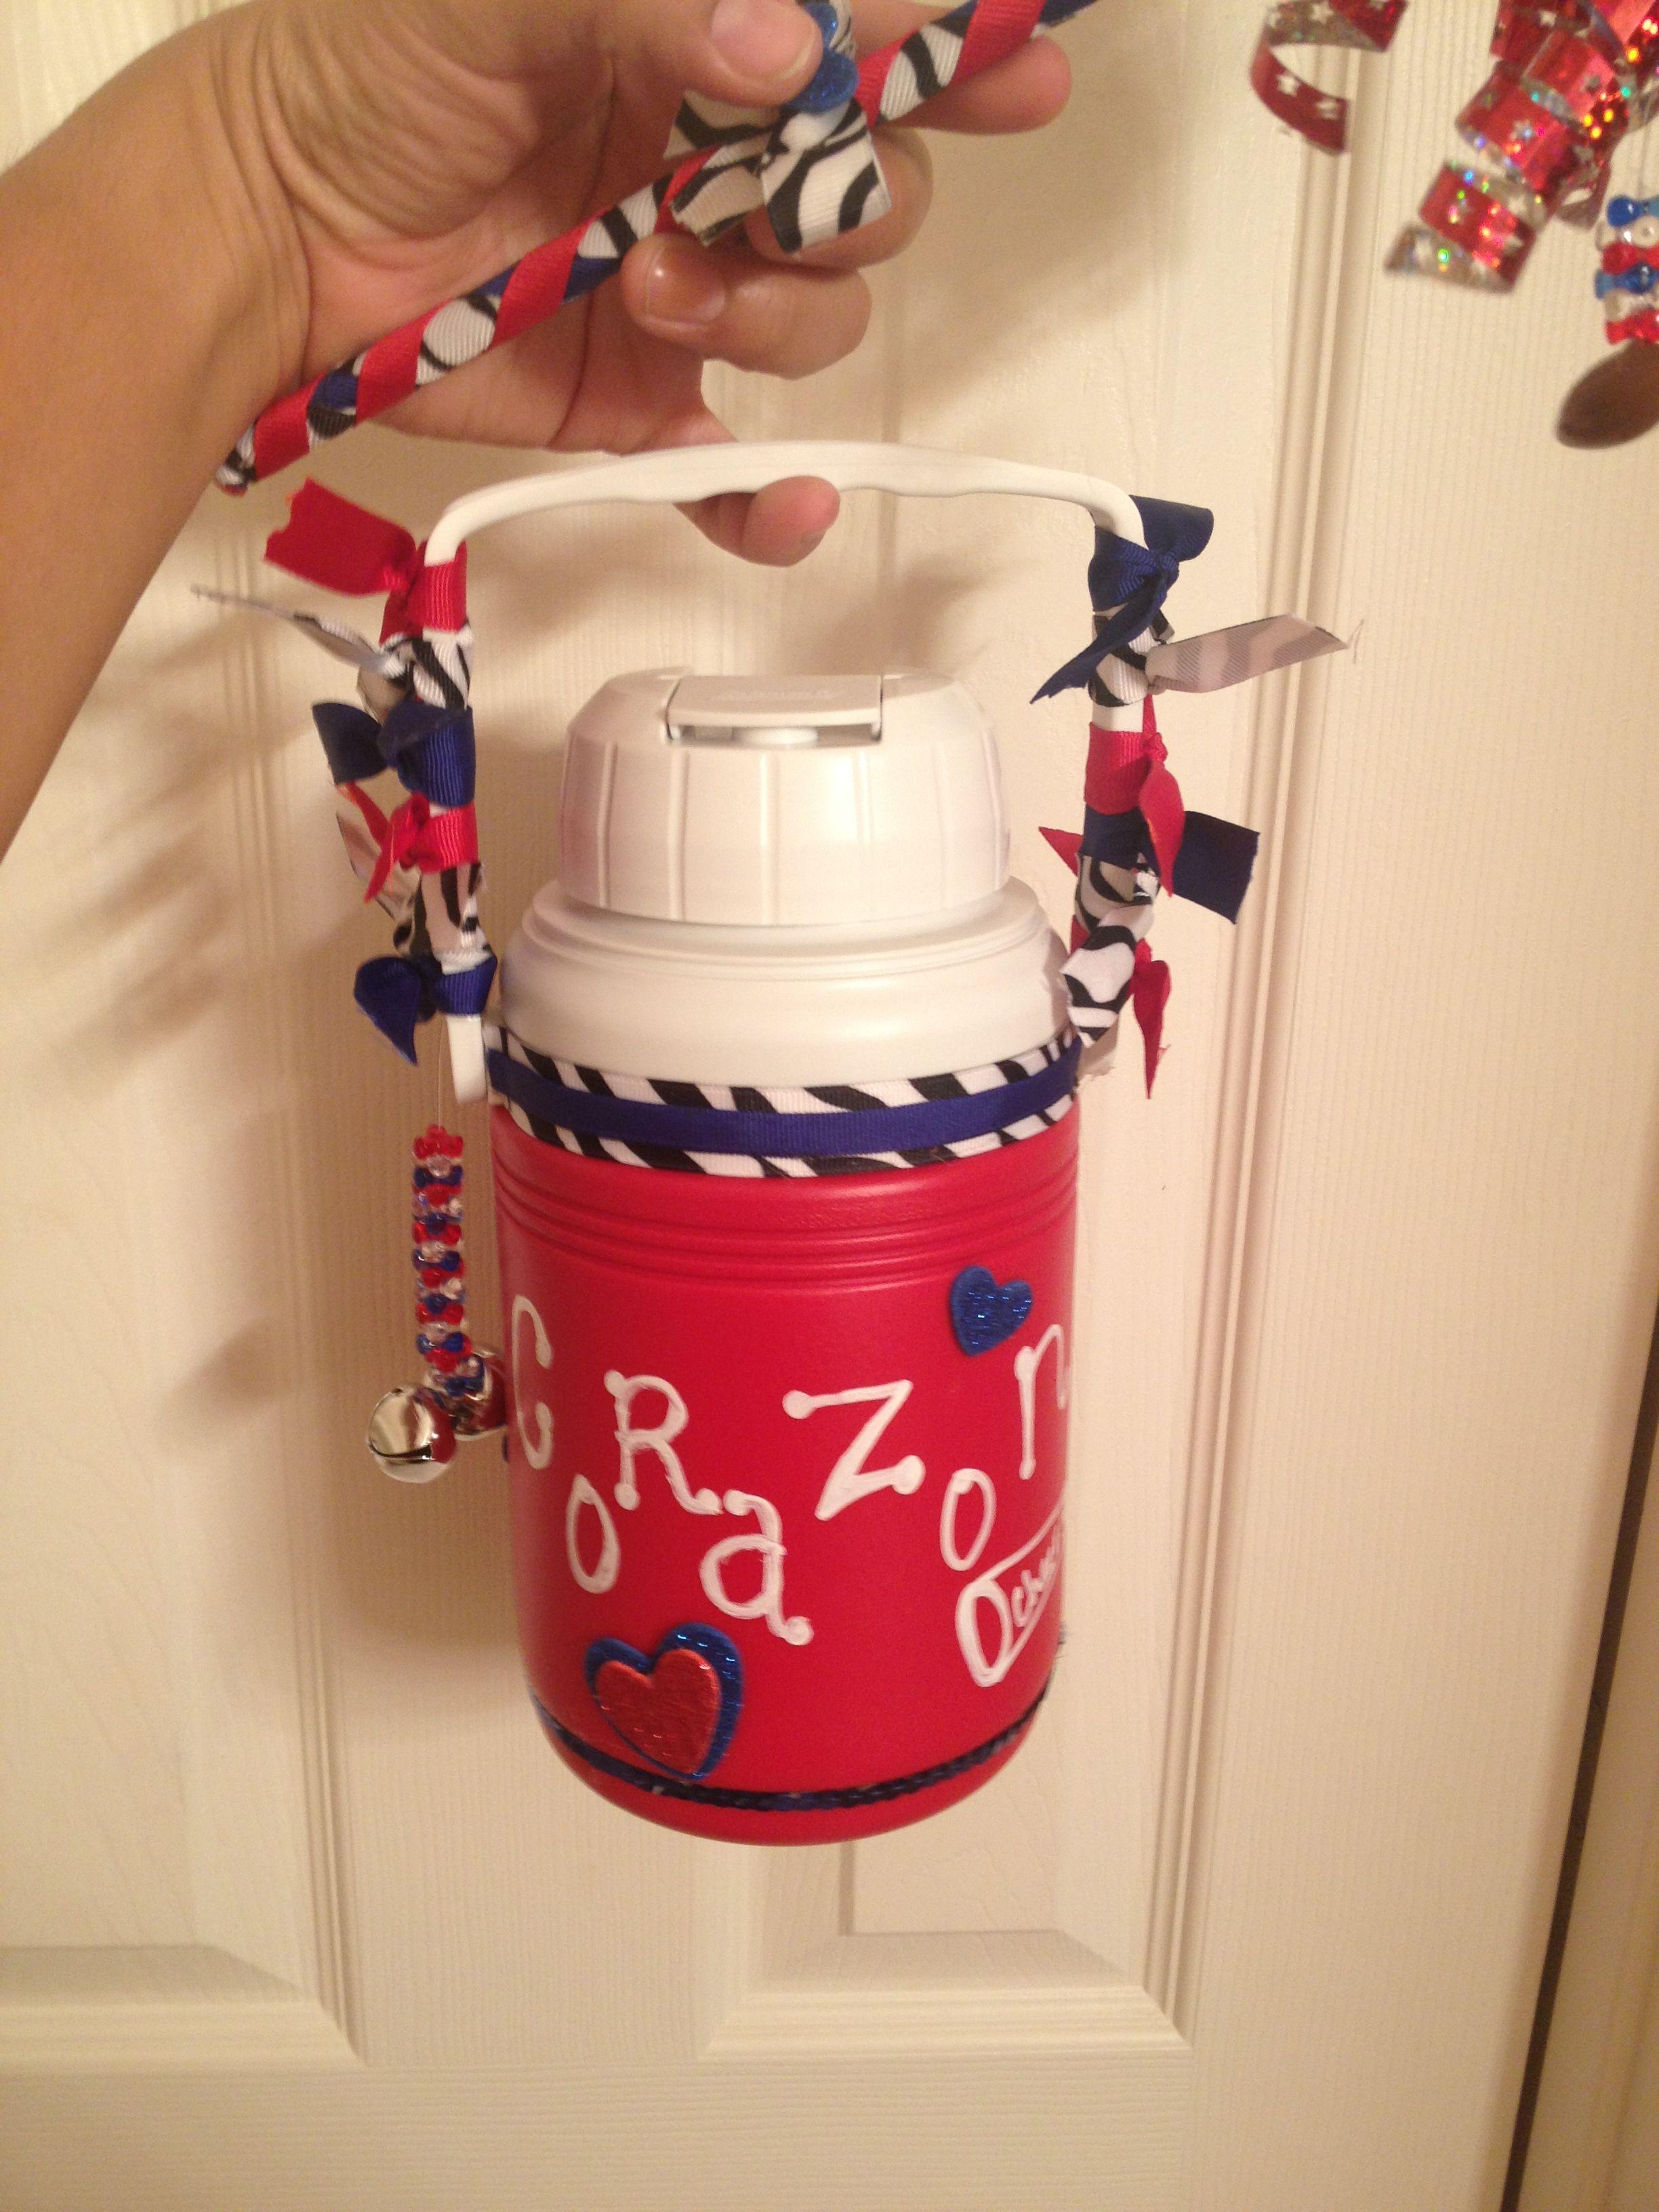 Giants water jug front cheer gifts cheer item cheer